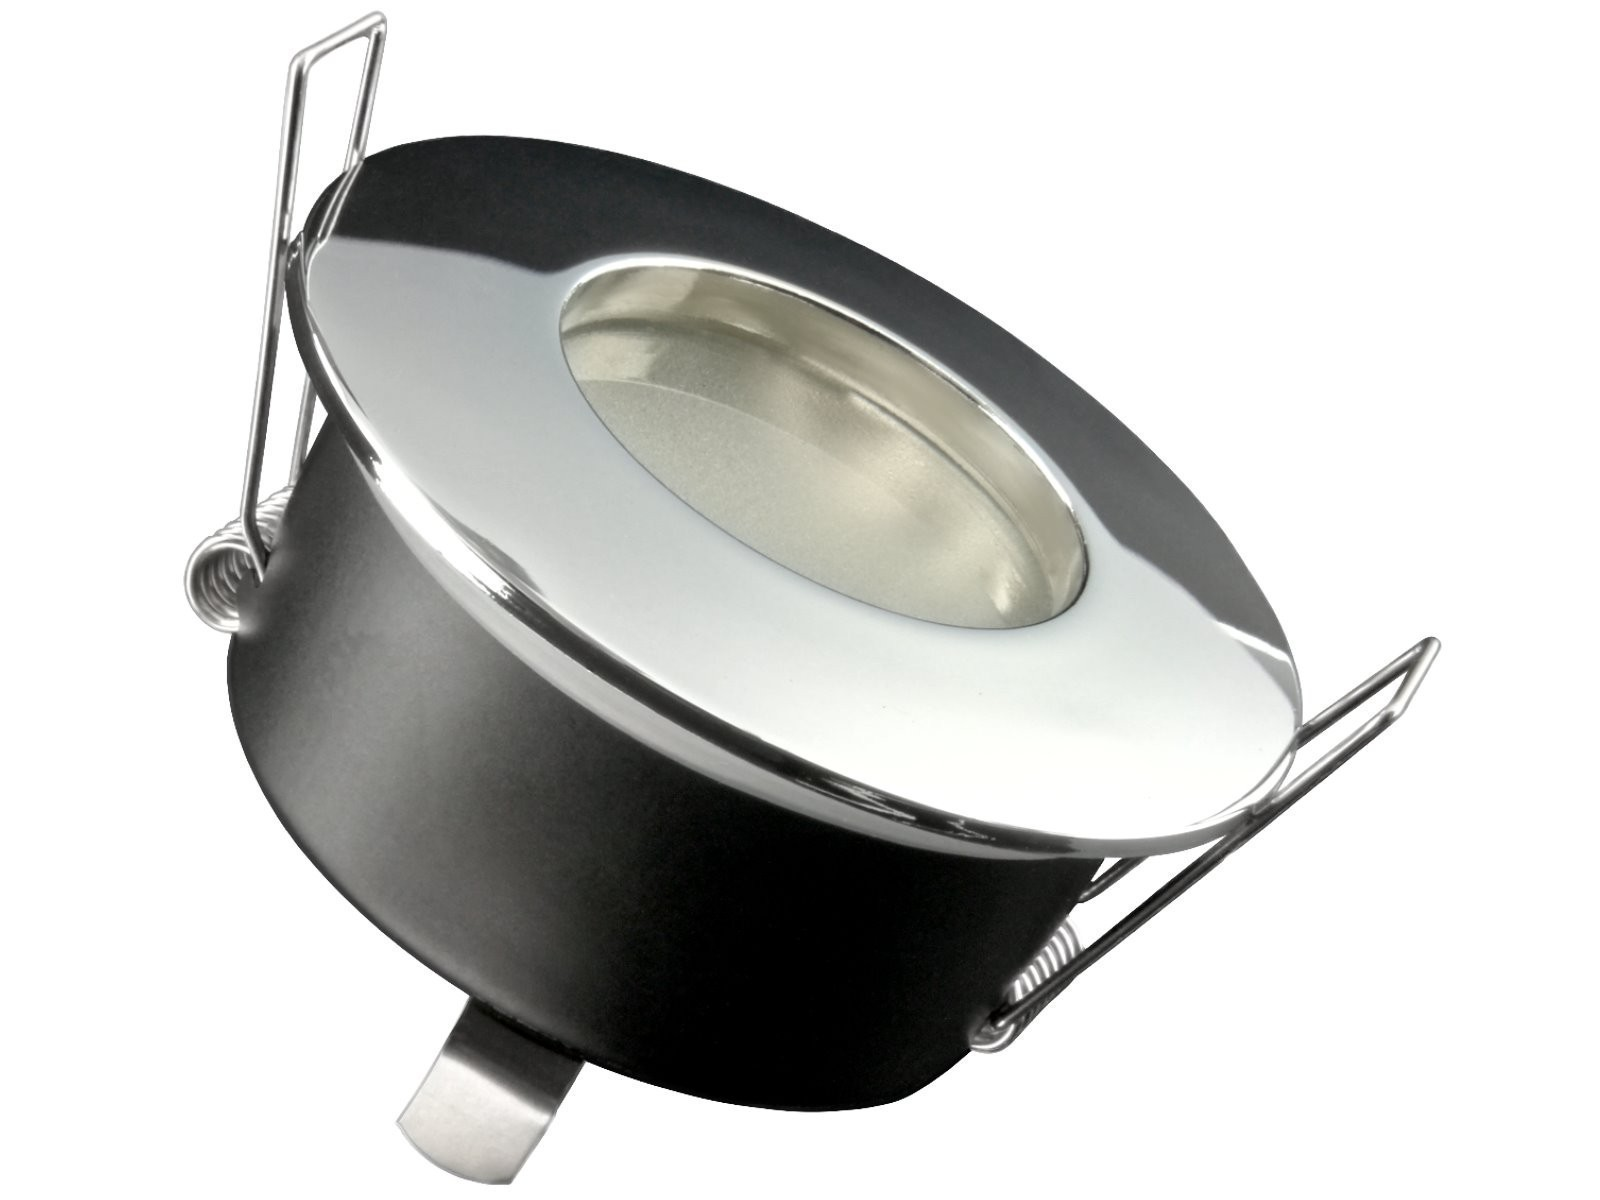 rw 1 feuchtraum led einbauspot strahler chrom ip65 bad dusche 5w cob led neutralwei gu10 230v. Black Bedroom Furniture Sets. Home Design Ideas